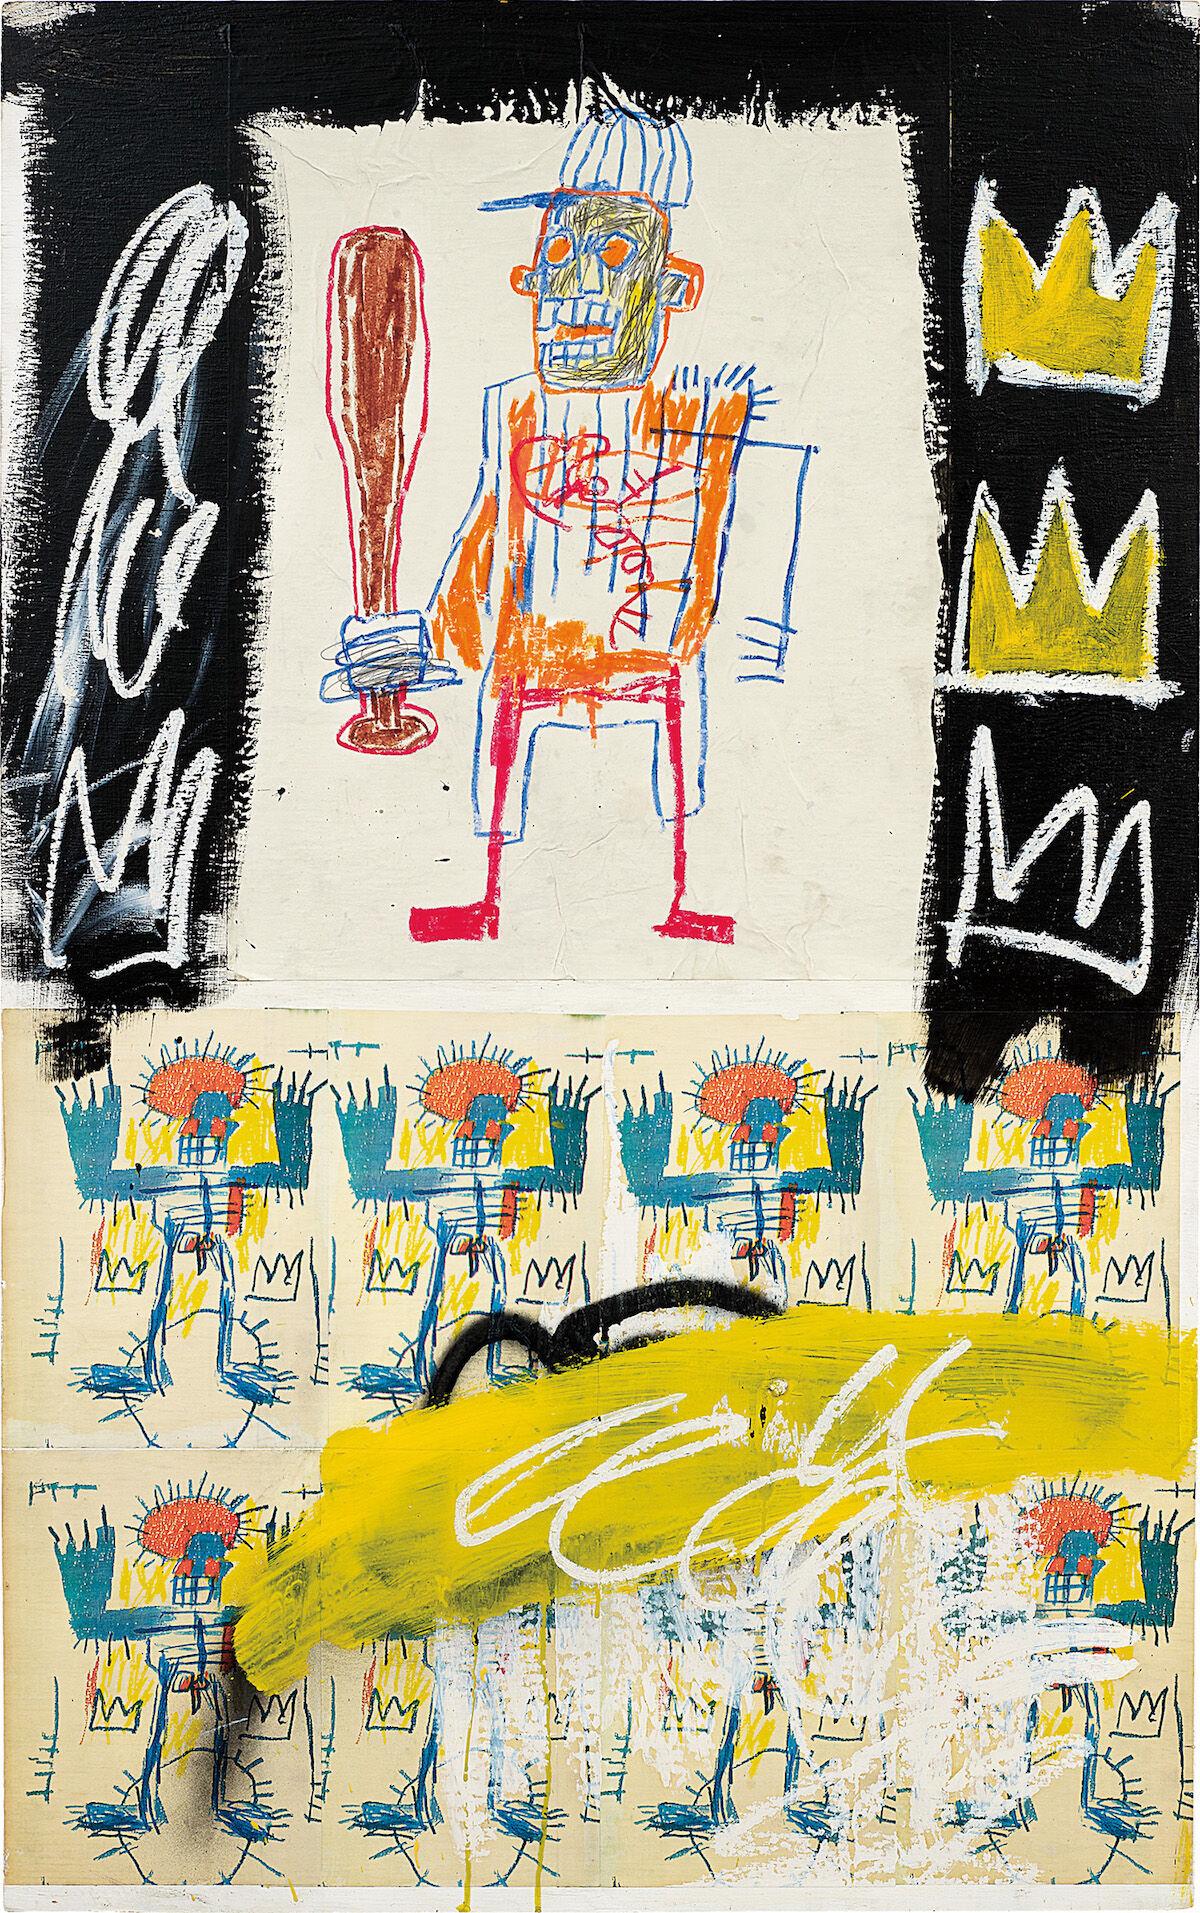 Jean-Michel Basquiat, Untitled, 1981. Courtesy Phillips.